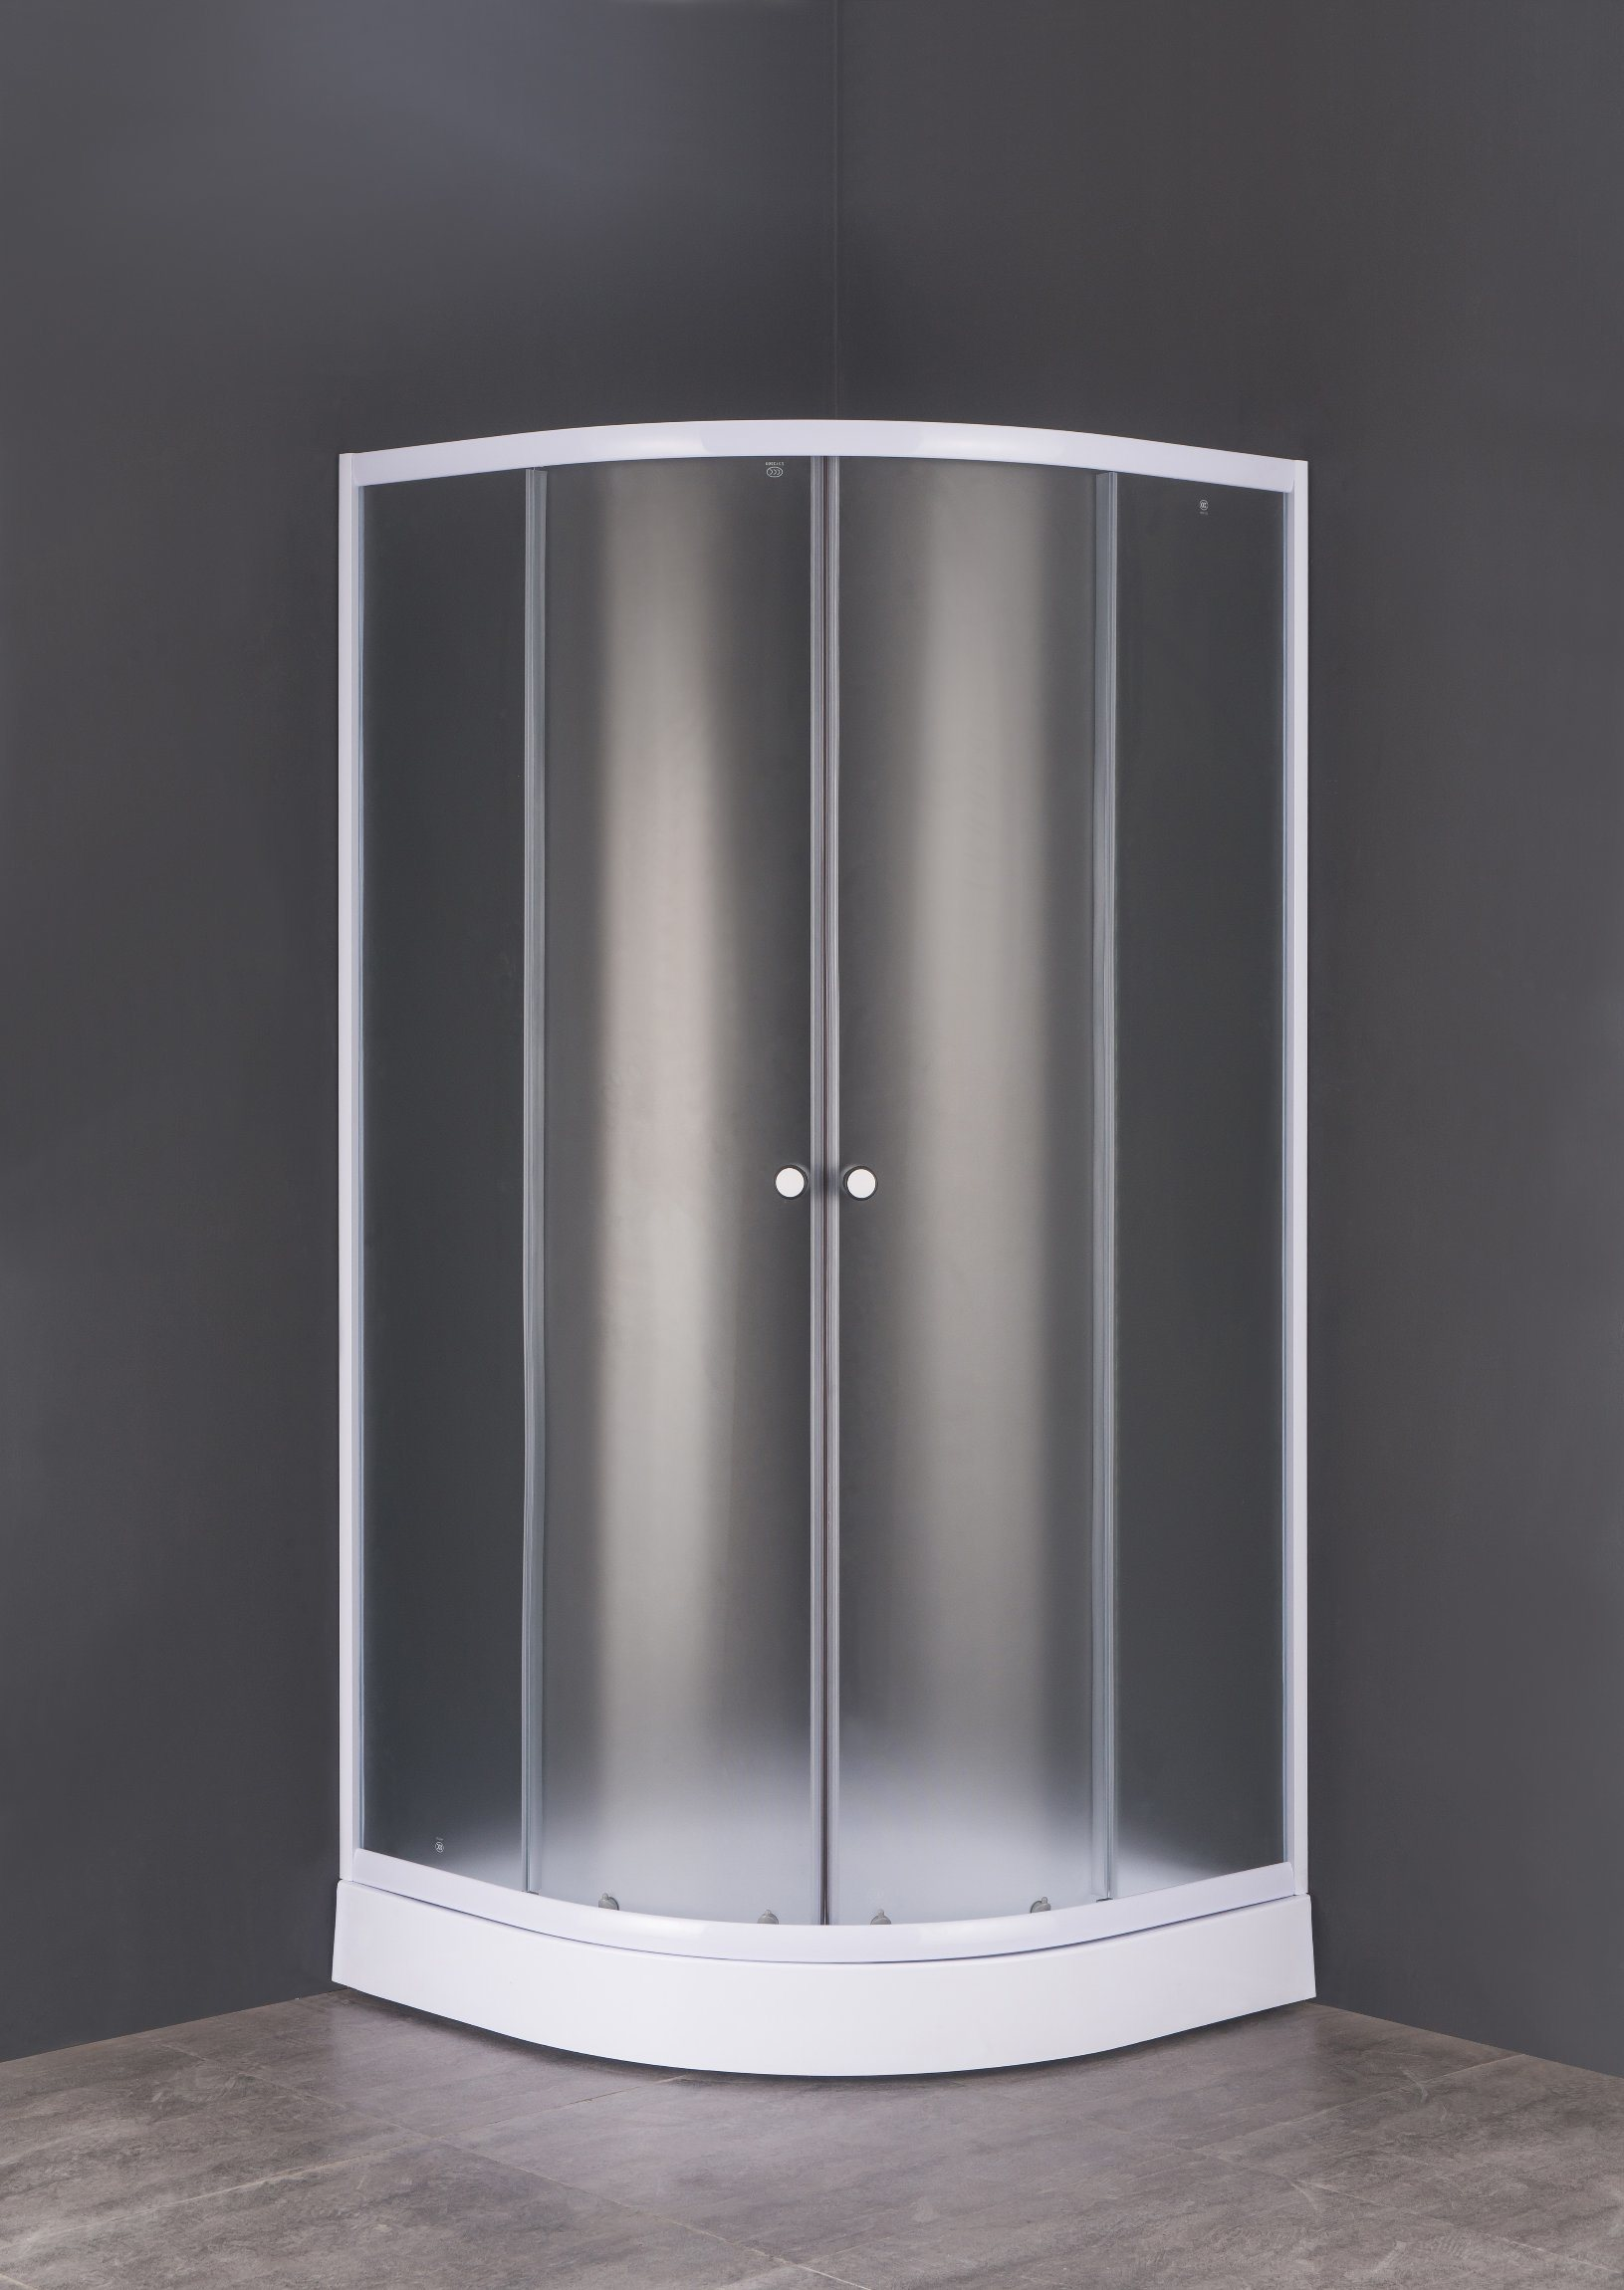 2017 China Round 90X90 Cheap Shower Enclosures - China Shower ...